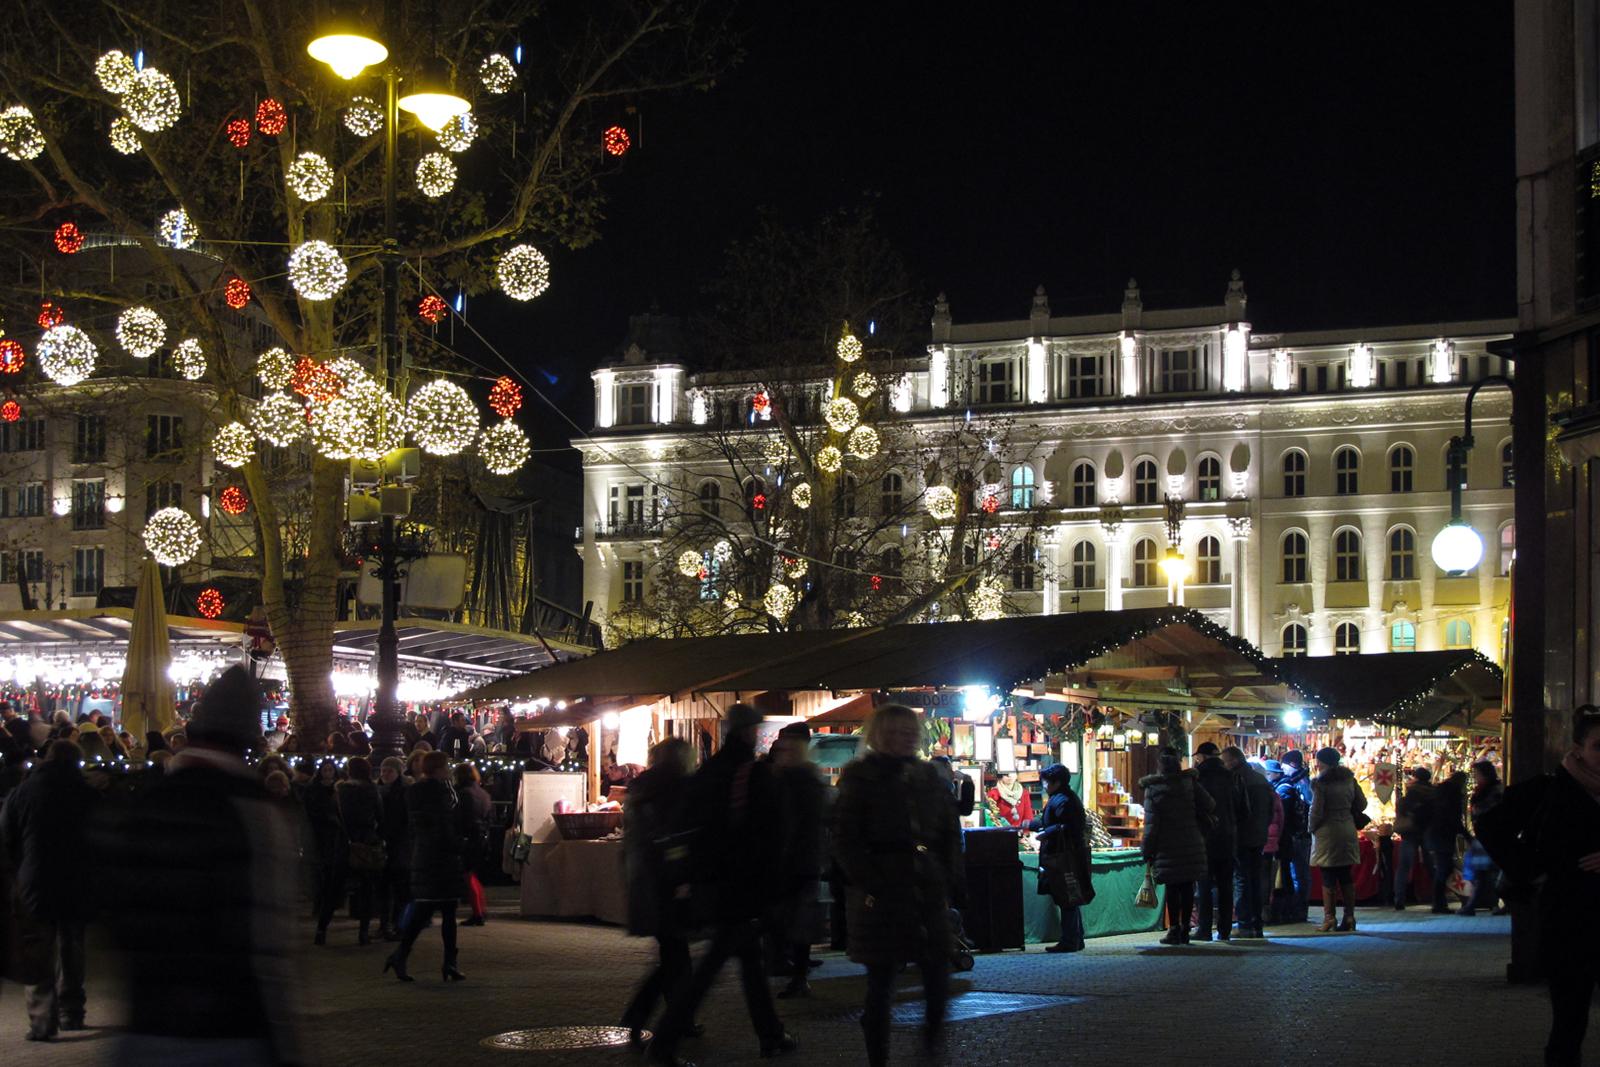 Mercatini di Natale Budapest 2019 date